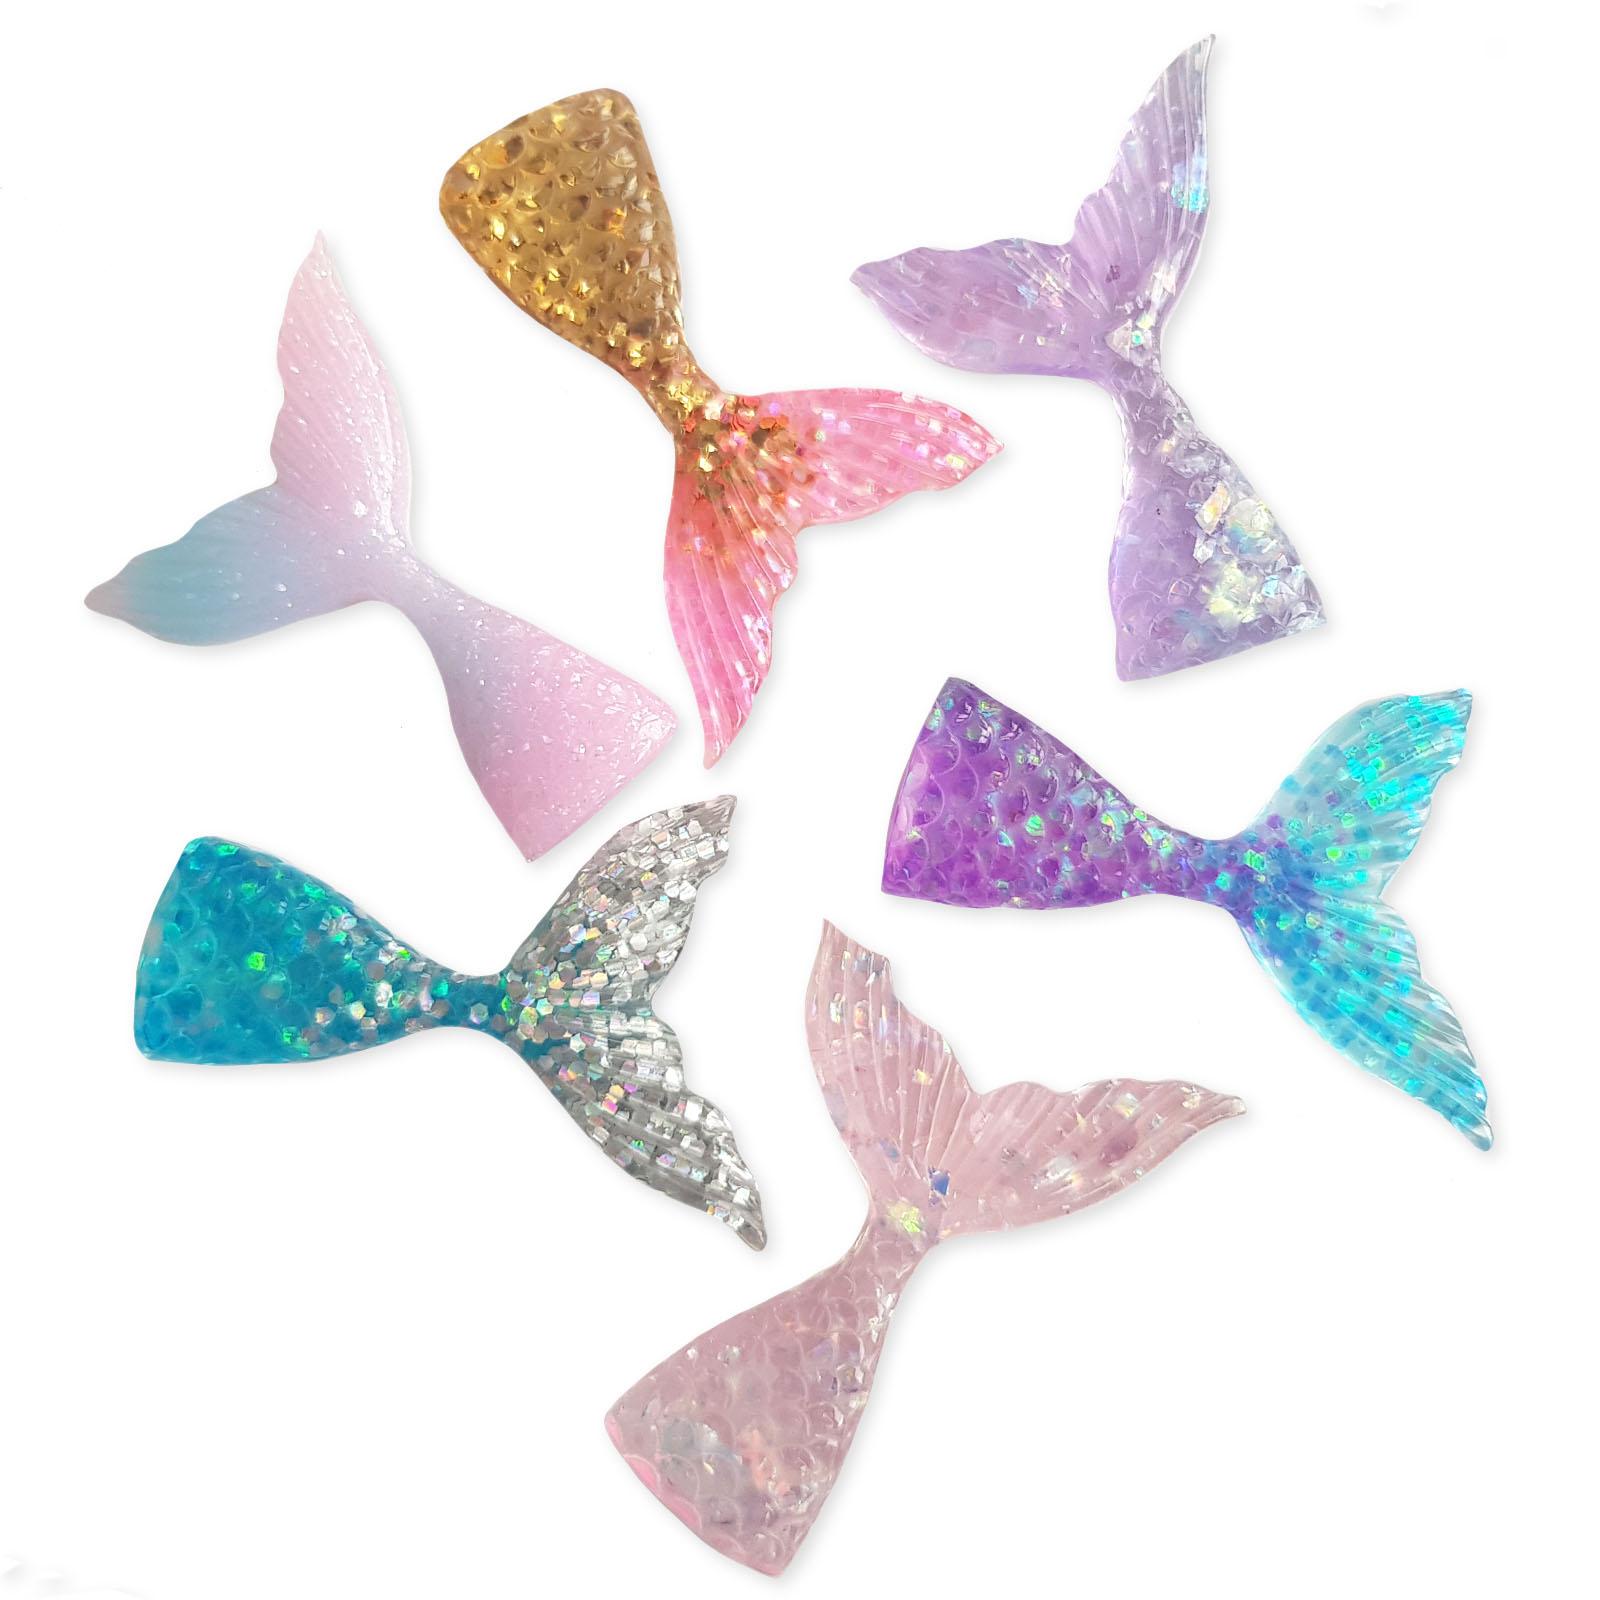 10 Glitter Mermaid Fish Tail Flatback Resin Cabochons Jewellery Making Crafts UK